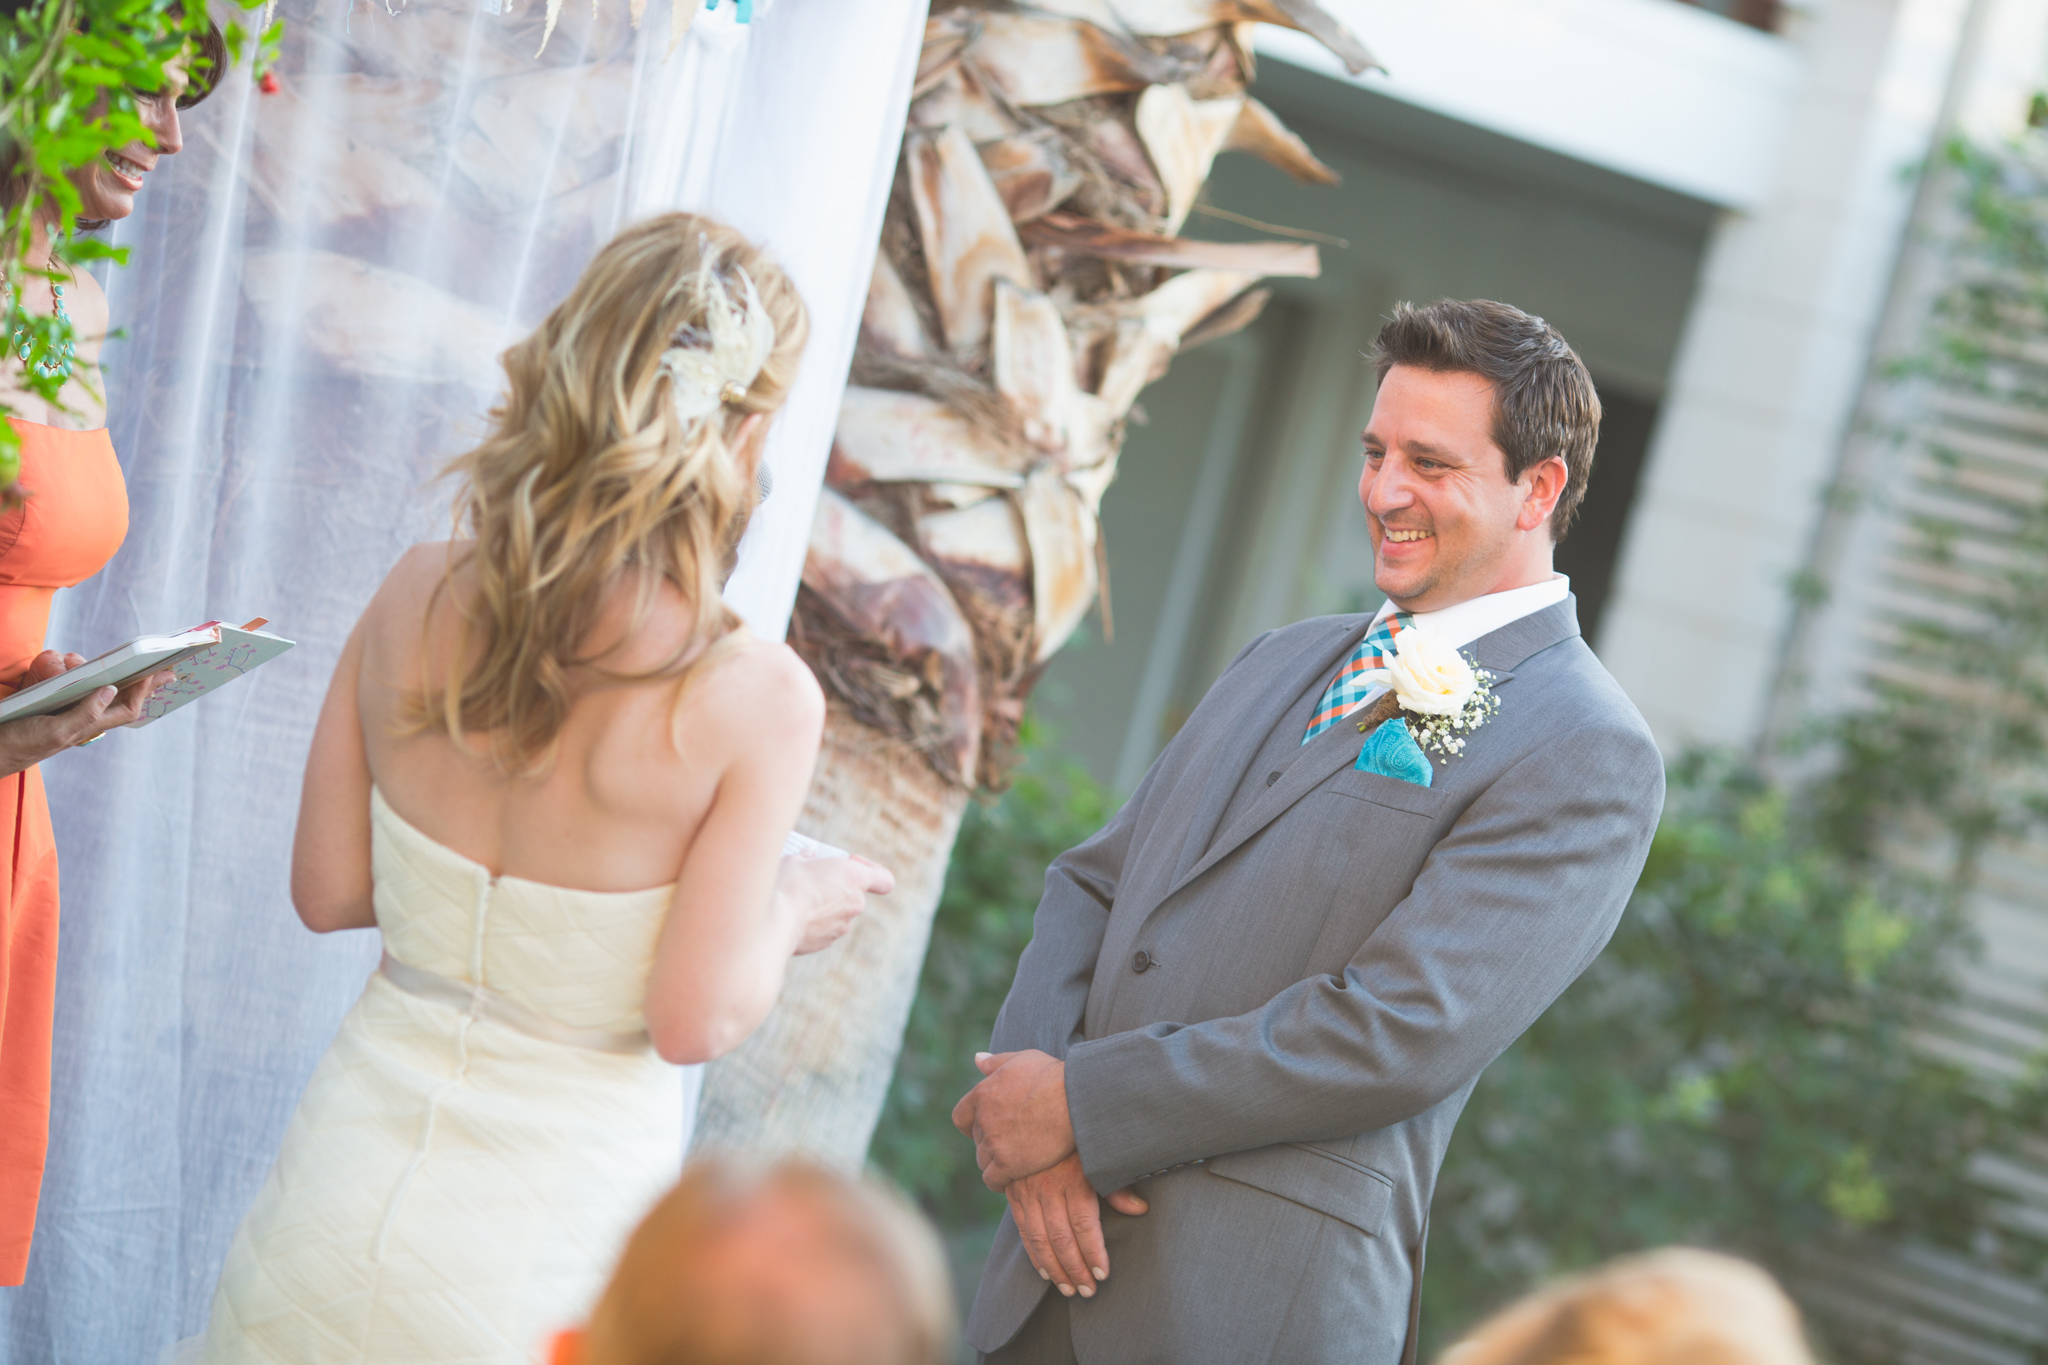 arizona-wedding-photographer-smiling-groom-ceremony